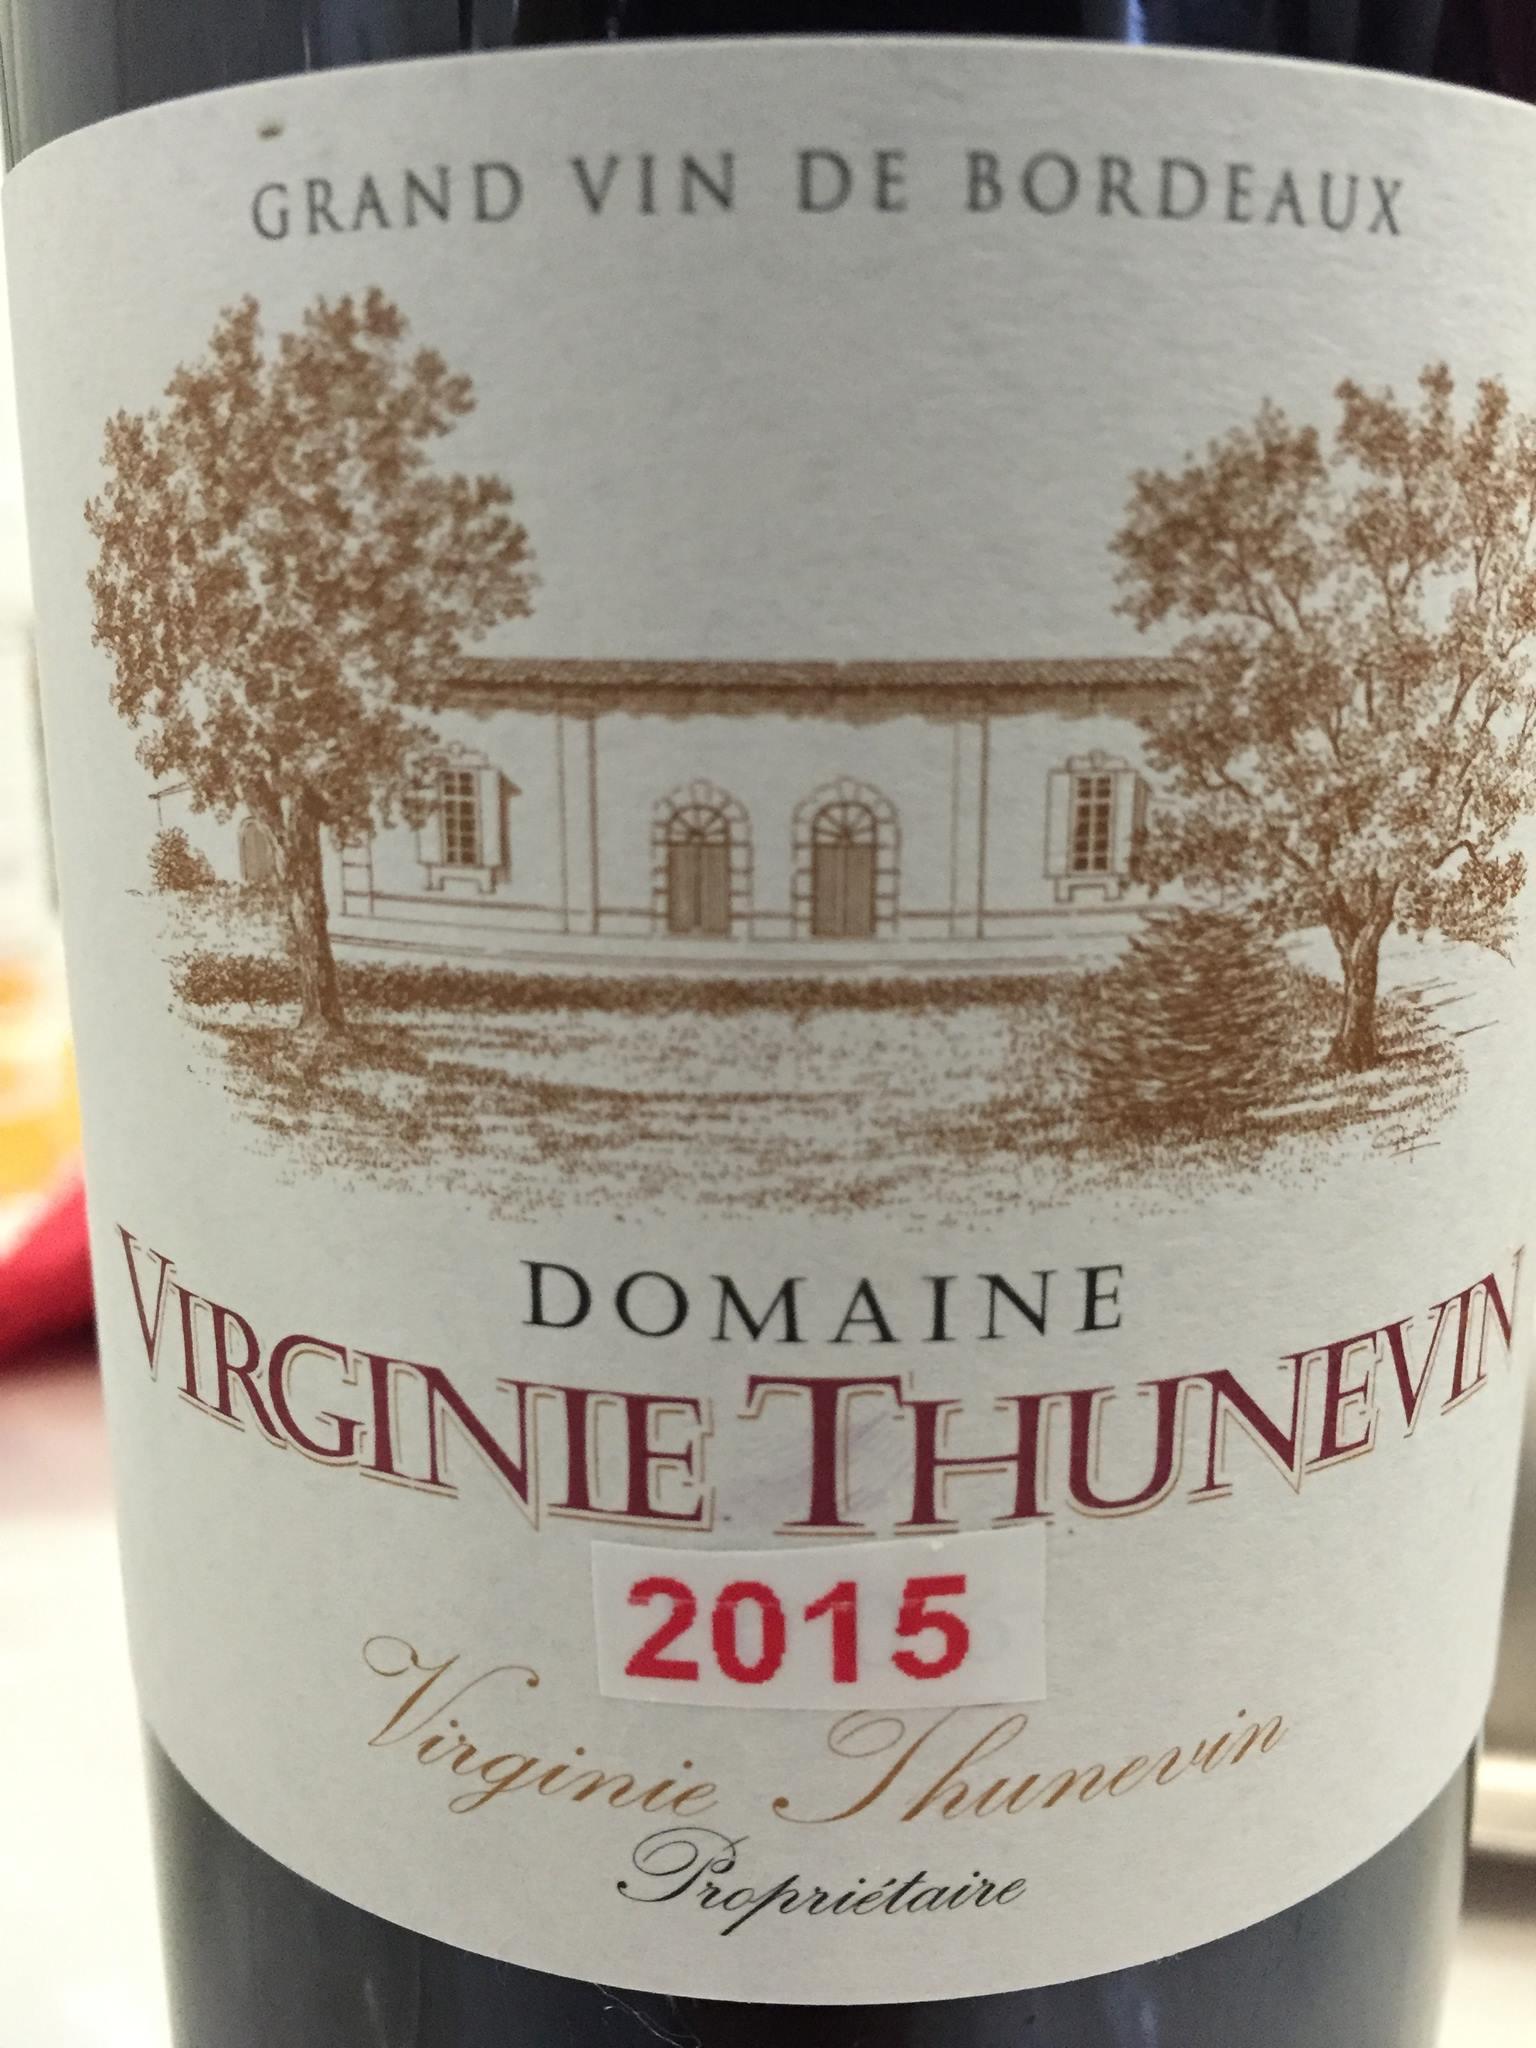 Domaine Virginie Thunevin 2015 – Bordeaux